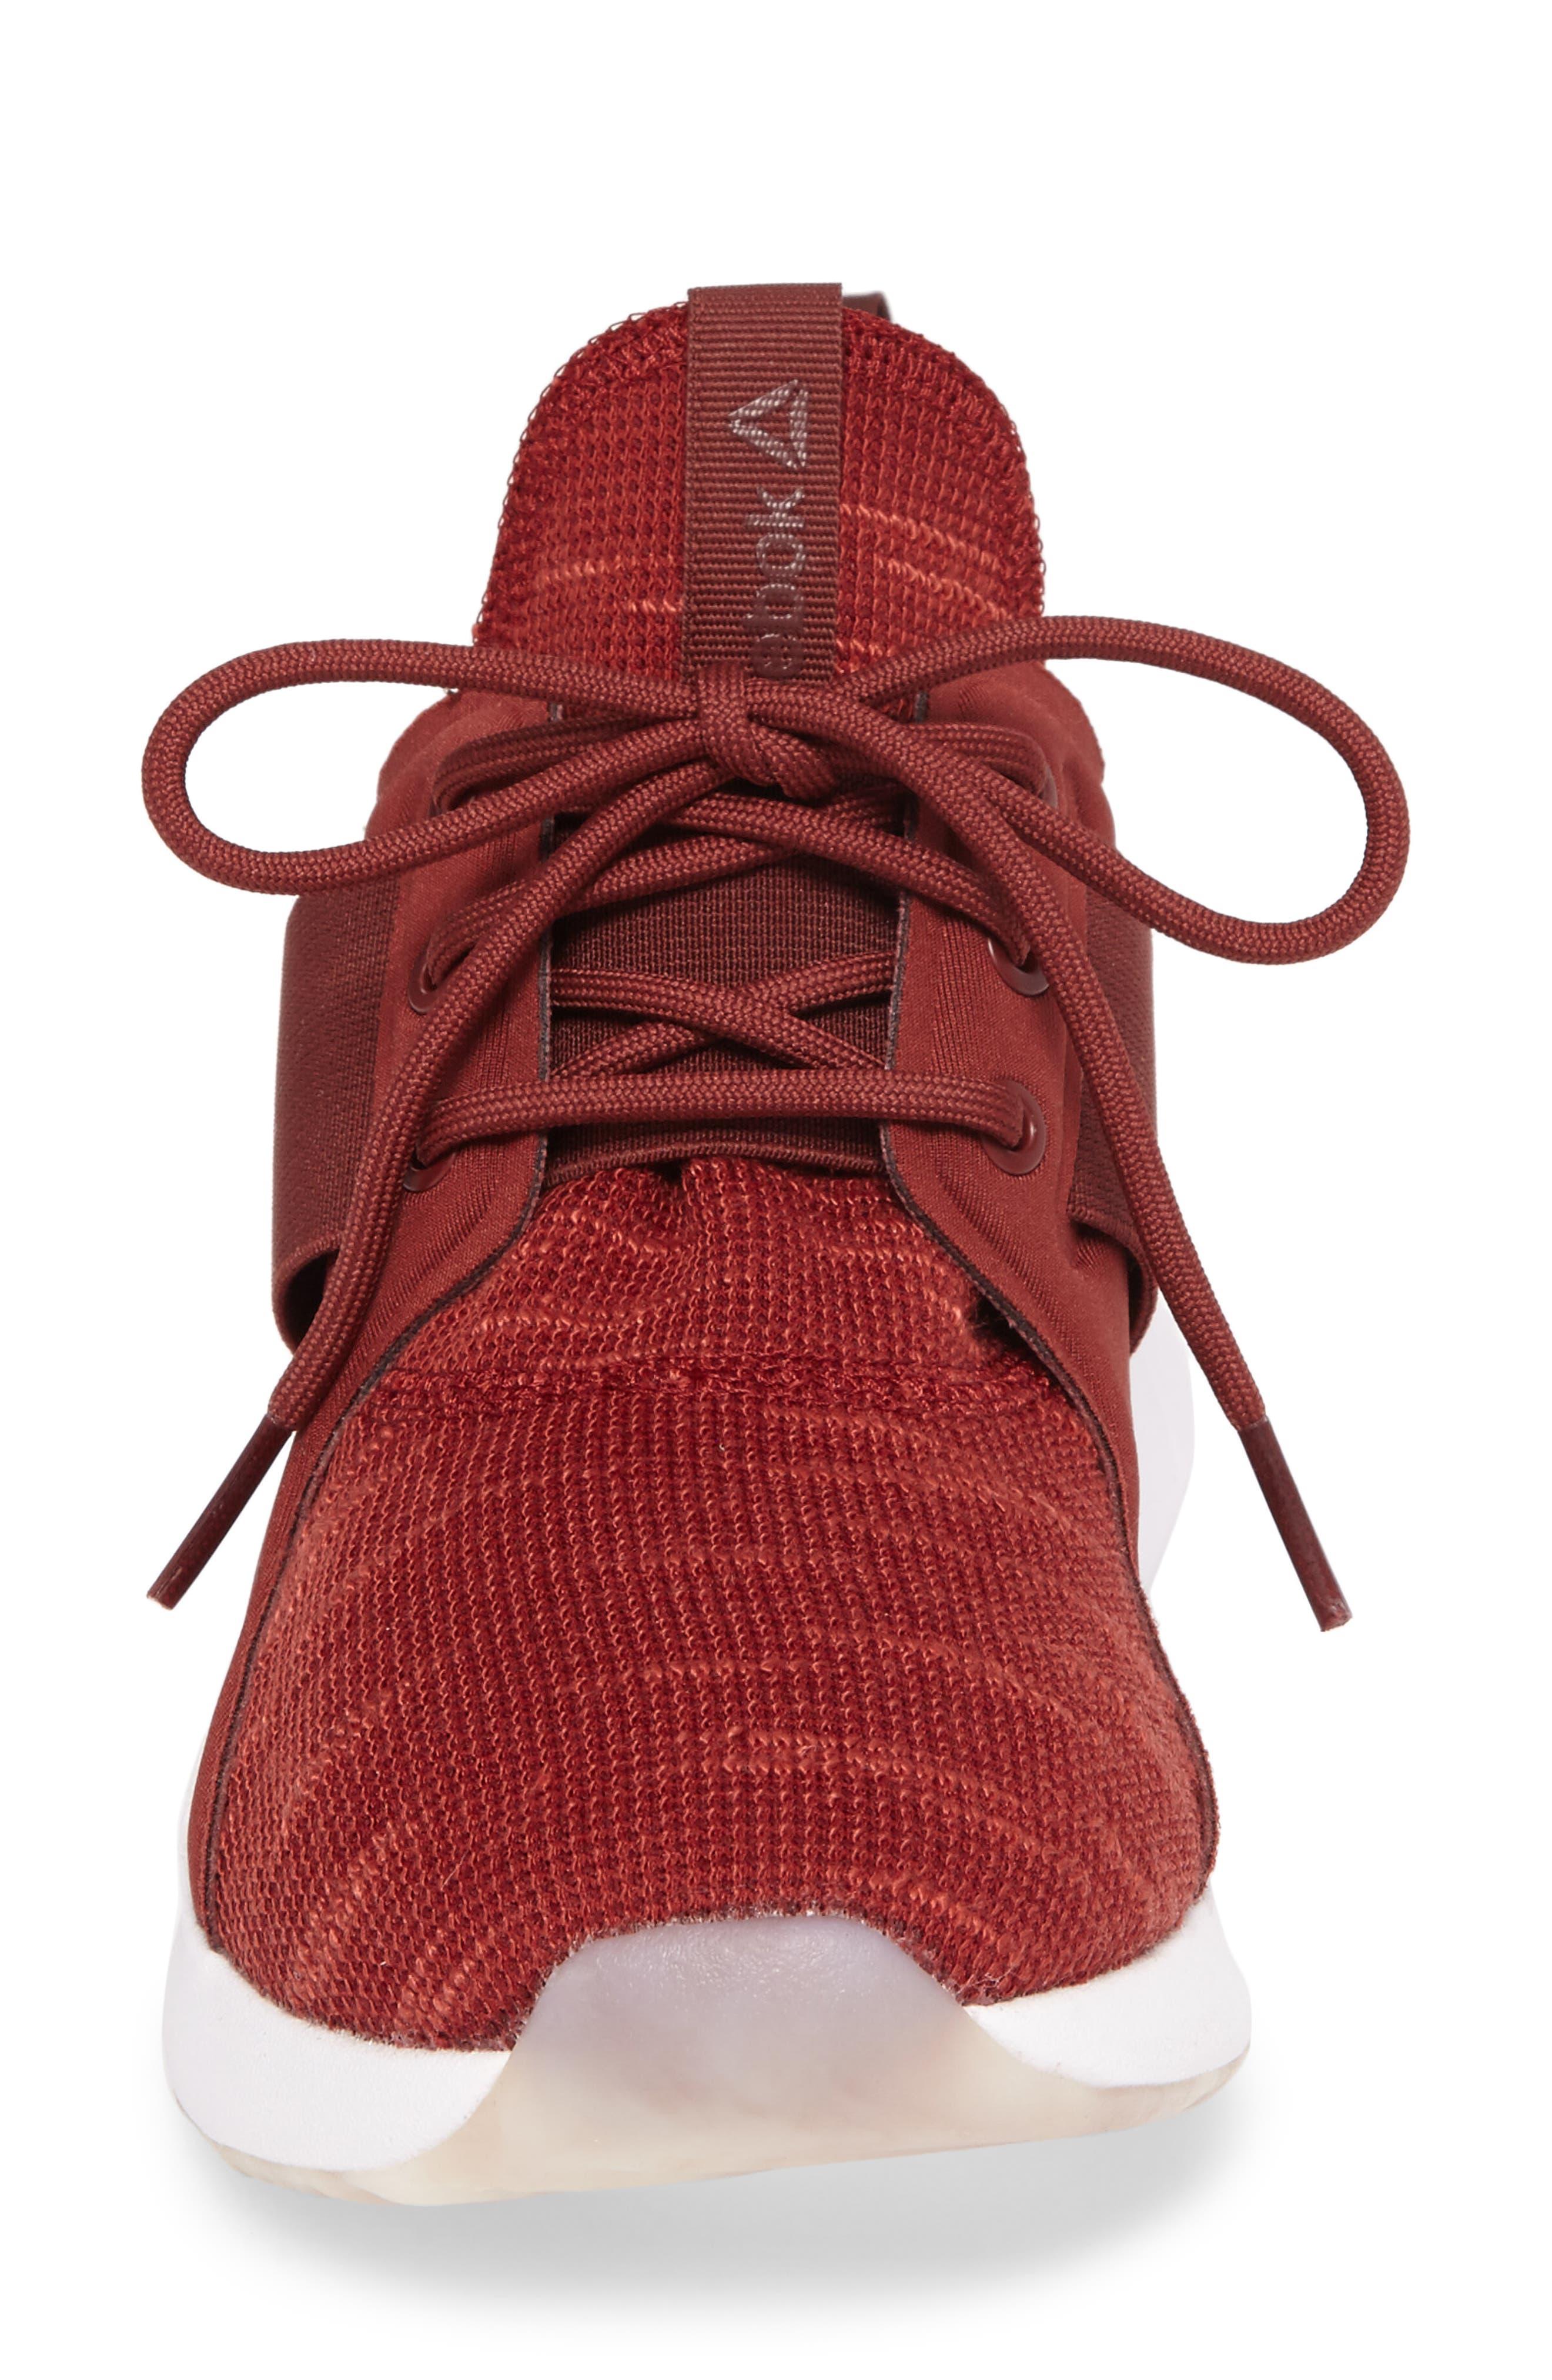 Guresu 1.0 Training Shoe,                             Alternate thumbnail 20, color,